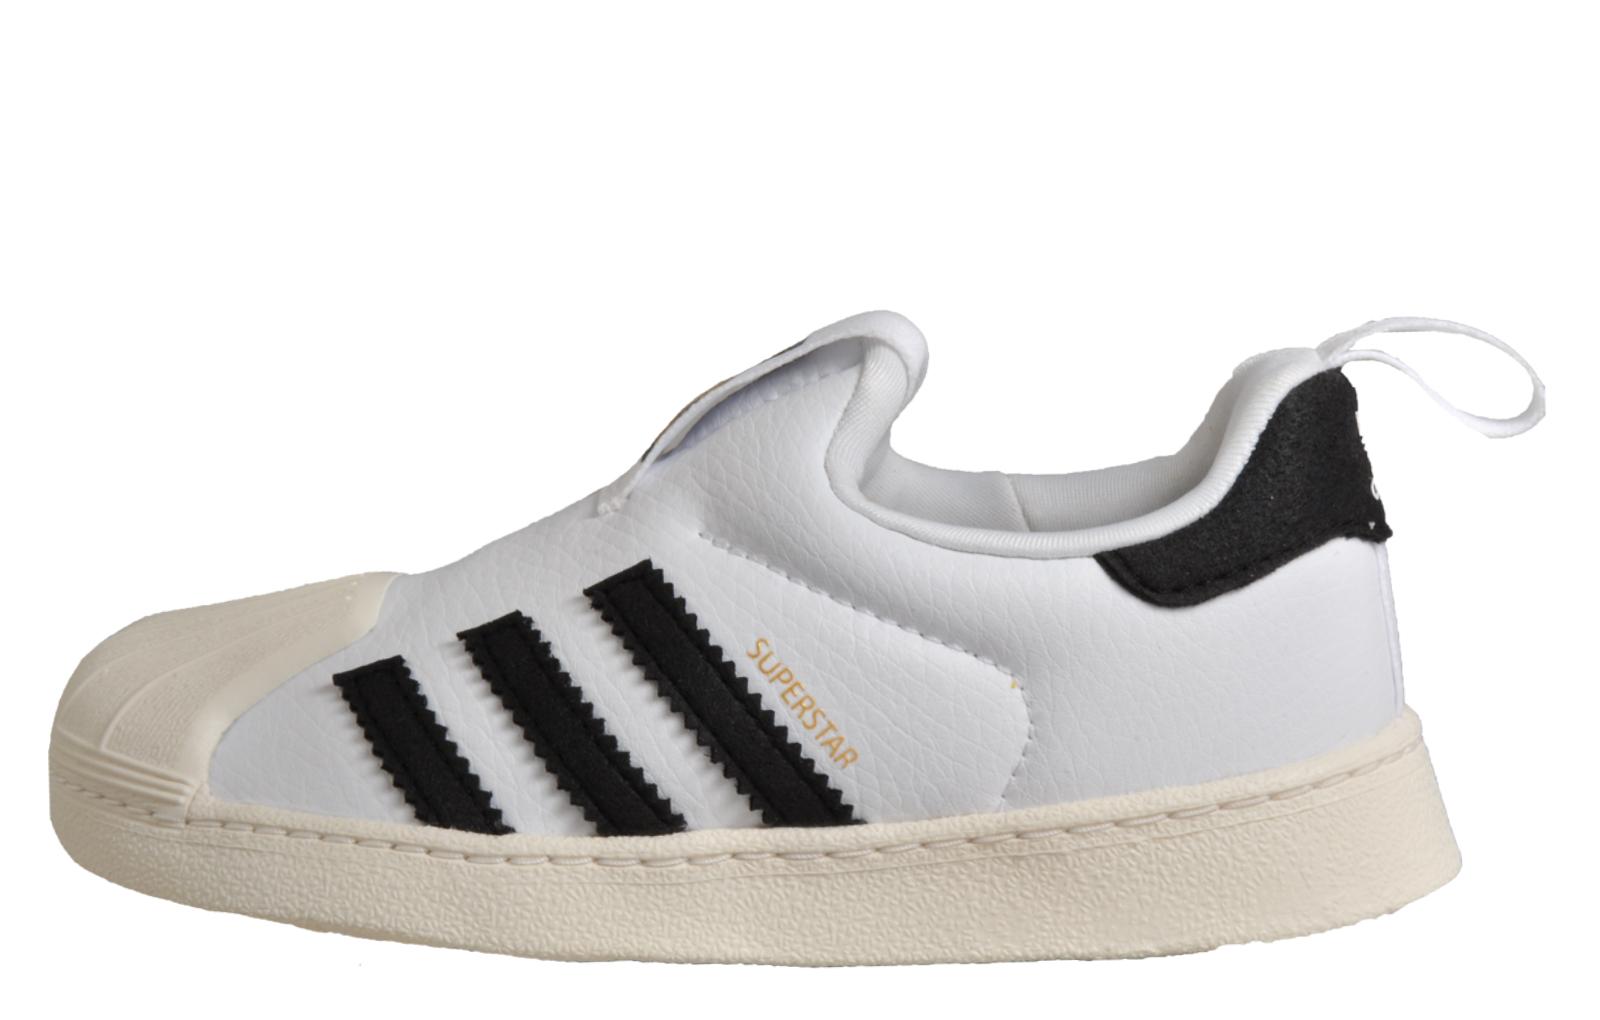 Adidas Originals Superstar 360 Infants Toddlers Babies Classic Retro  Trainers White 20dec5e86